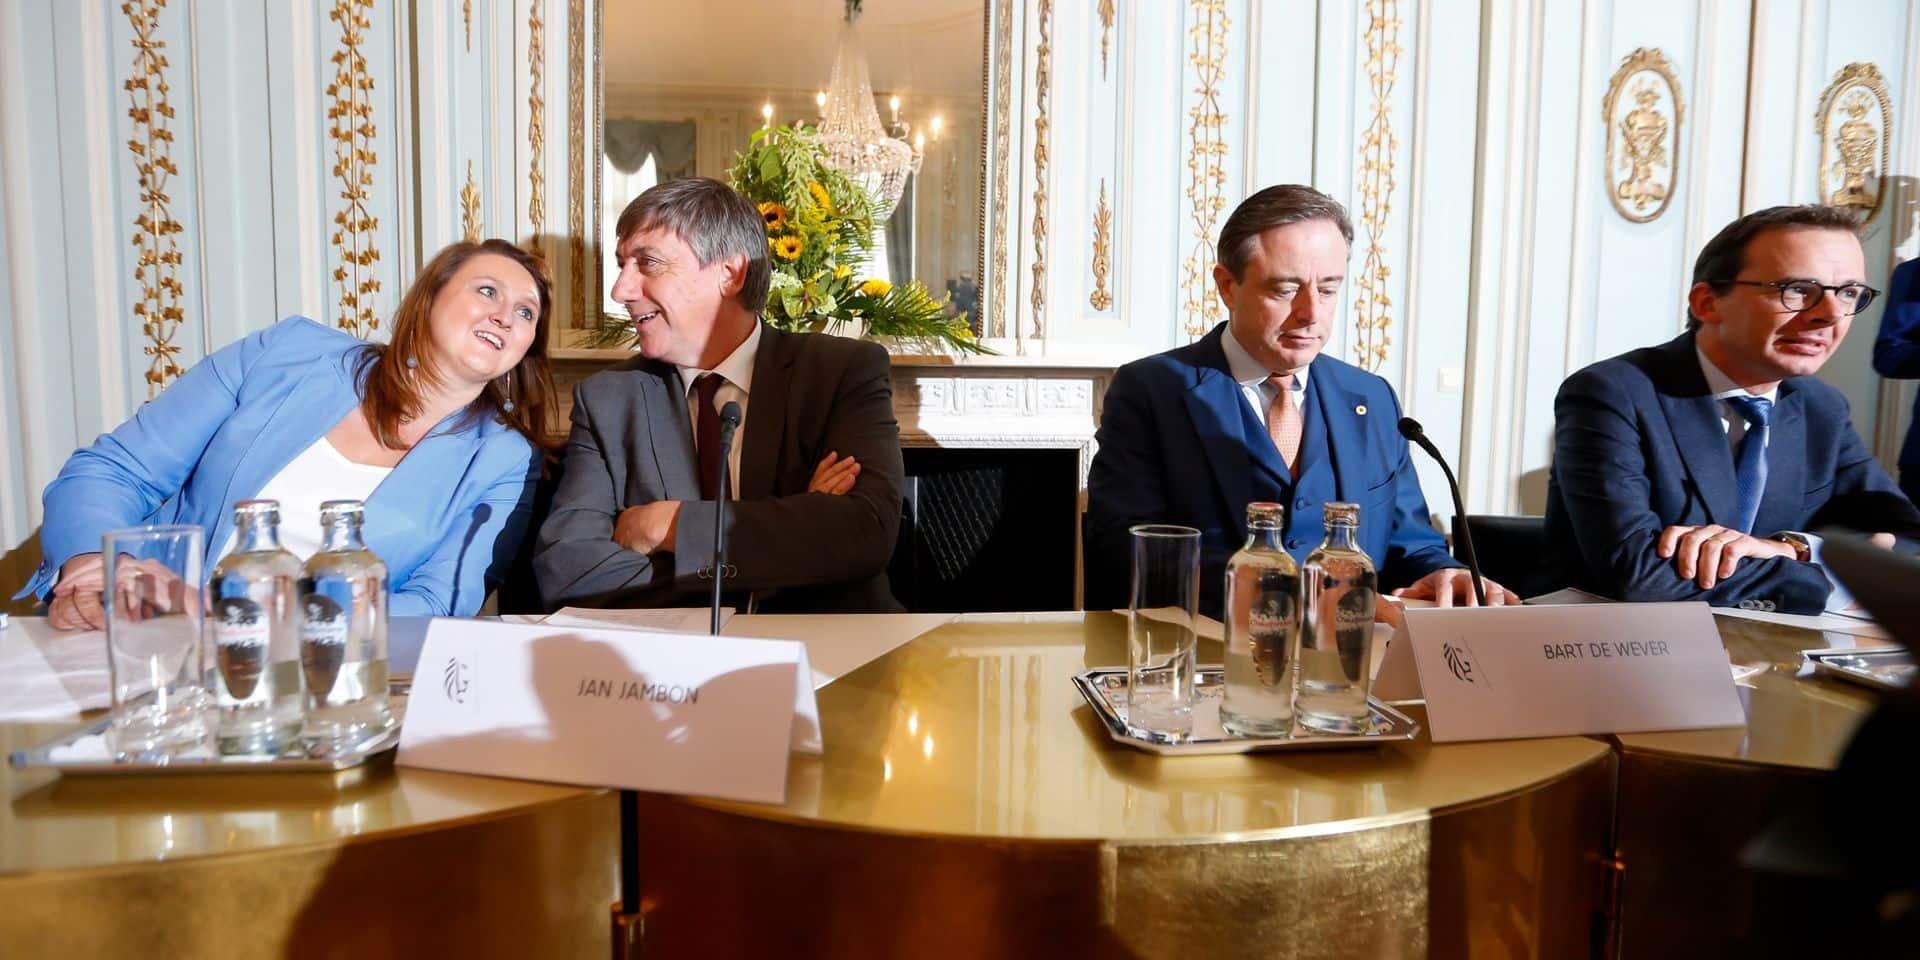 Gwendolyn Rutten (Open Vld), Jan Jambon (N-VA), Bart De Wever (N-VA) et Wouter Beke (CD&V).